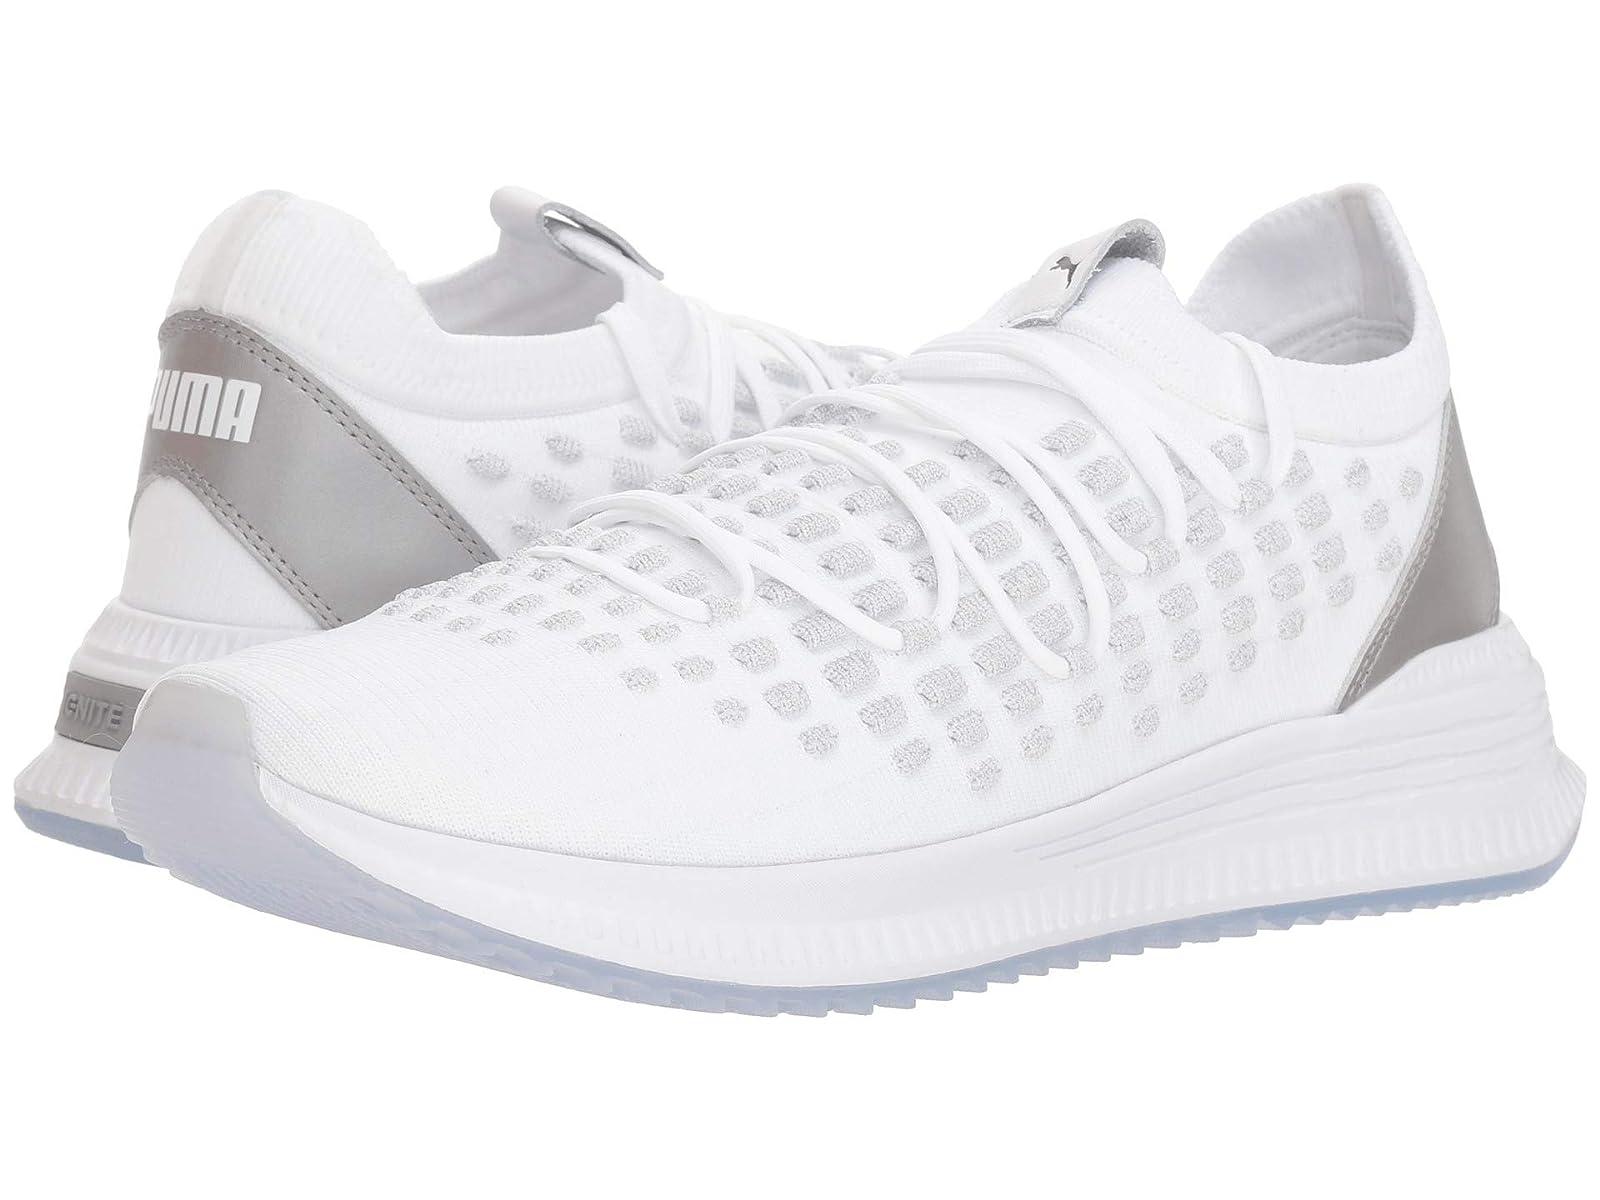 PUMA Avid FusefitAtmospheric grades have affordable shoes